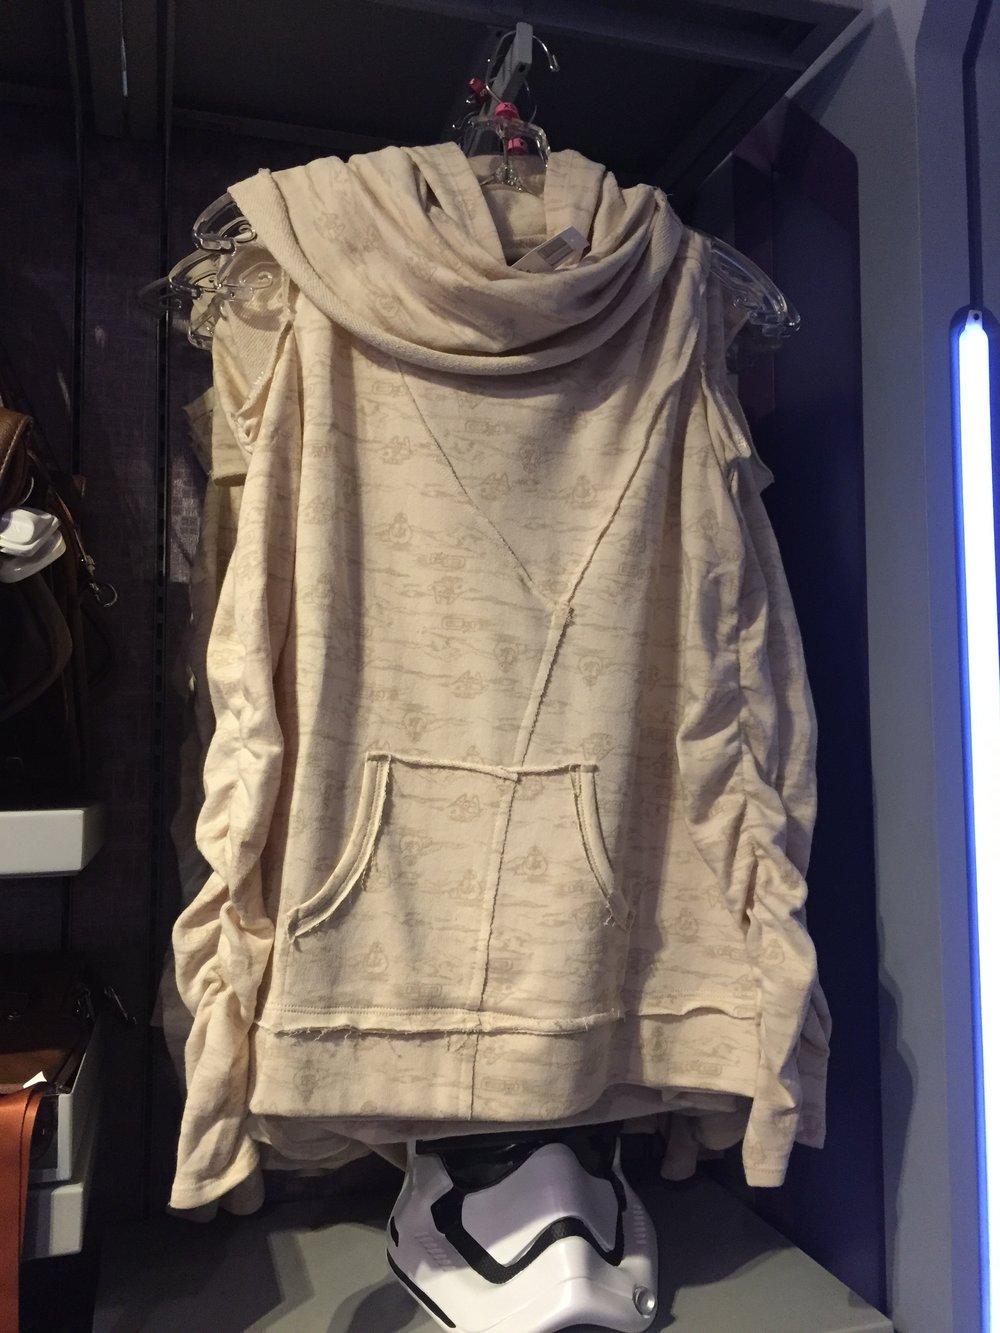 Rey hoodie by Her Universe